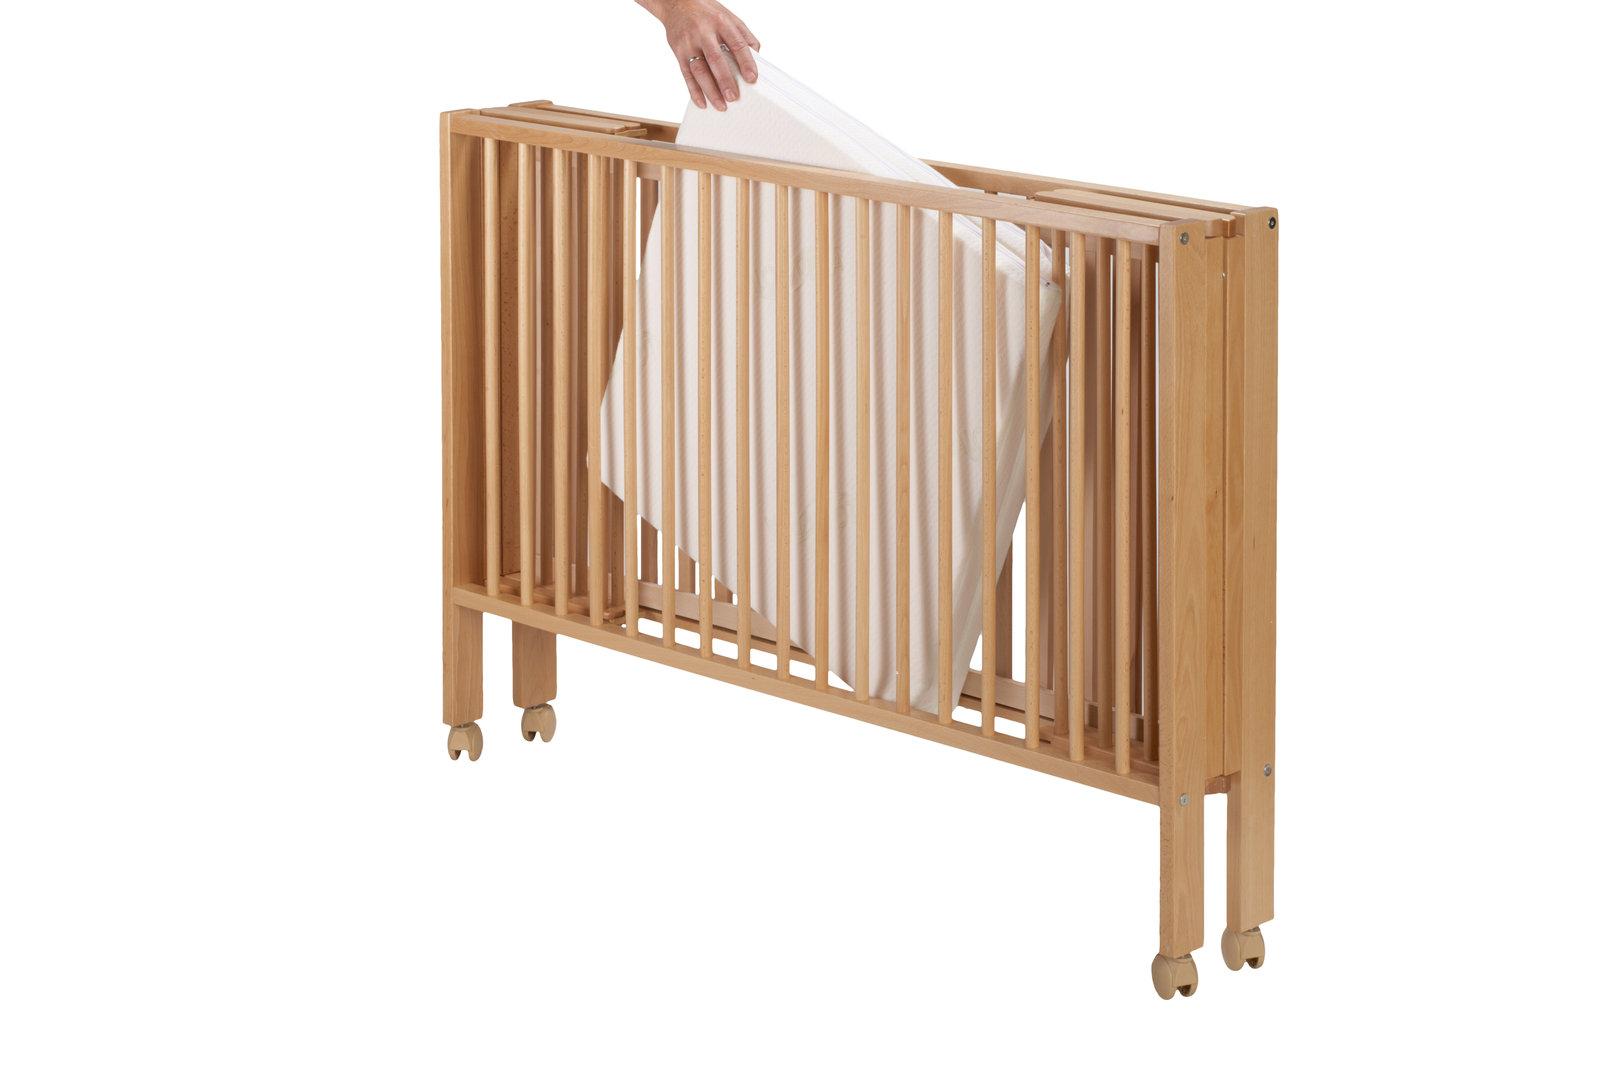 dawost tissi reisebett kinderbett klappbett matratze precogs. Black Bedroom Furniture Sets. Home Design Ideas